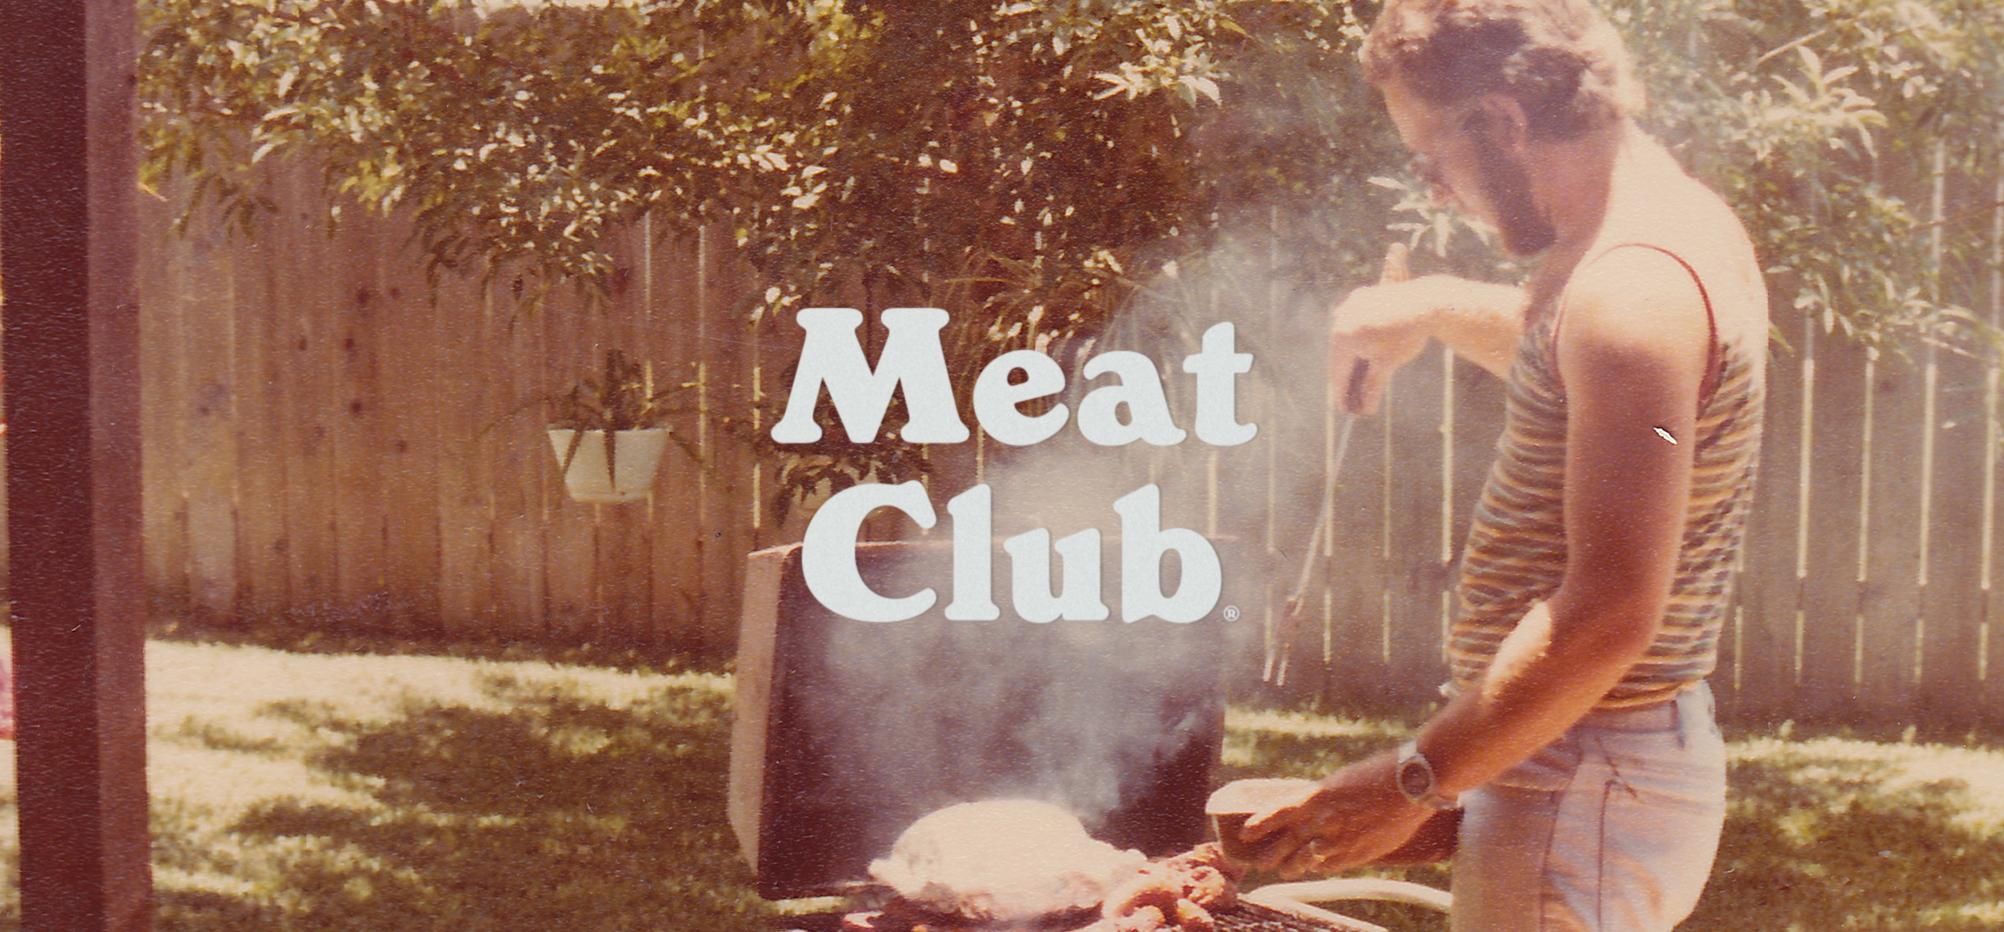 C_Stock_MeatClub_Web_Page1.jpg